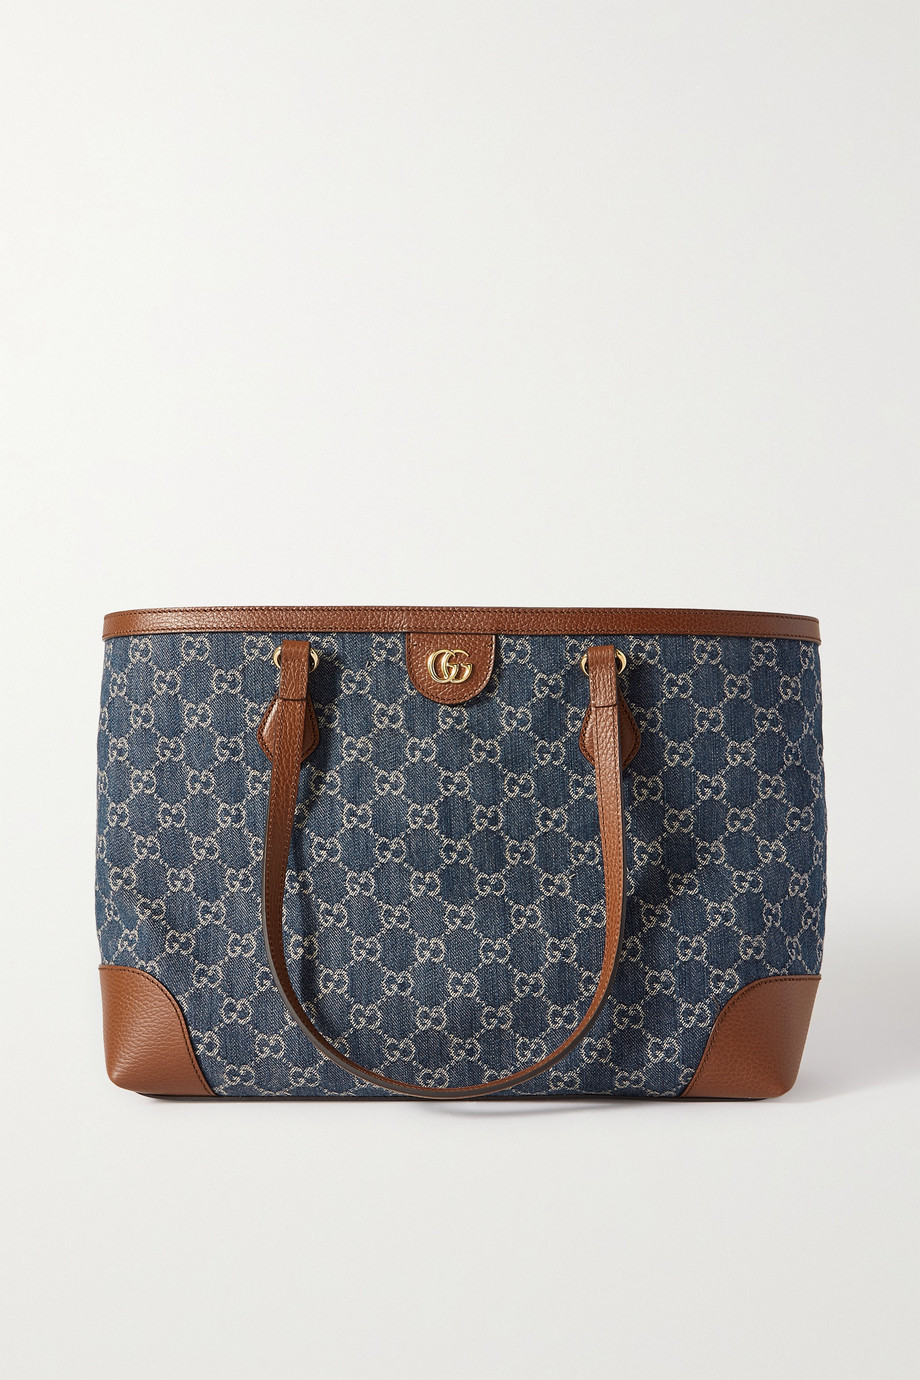 Gucci Ophidia medium textured leather-trimmed logo-jacquard denim tote